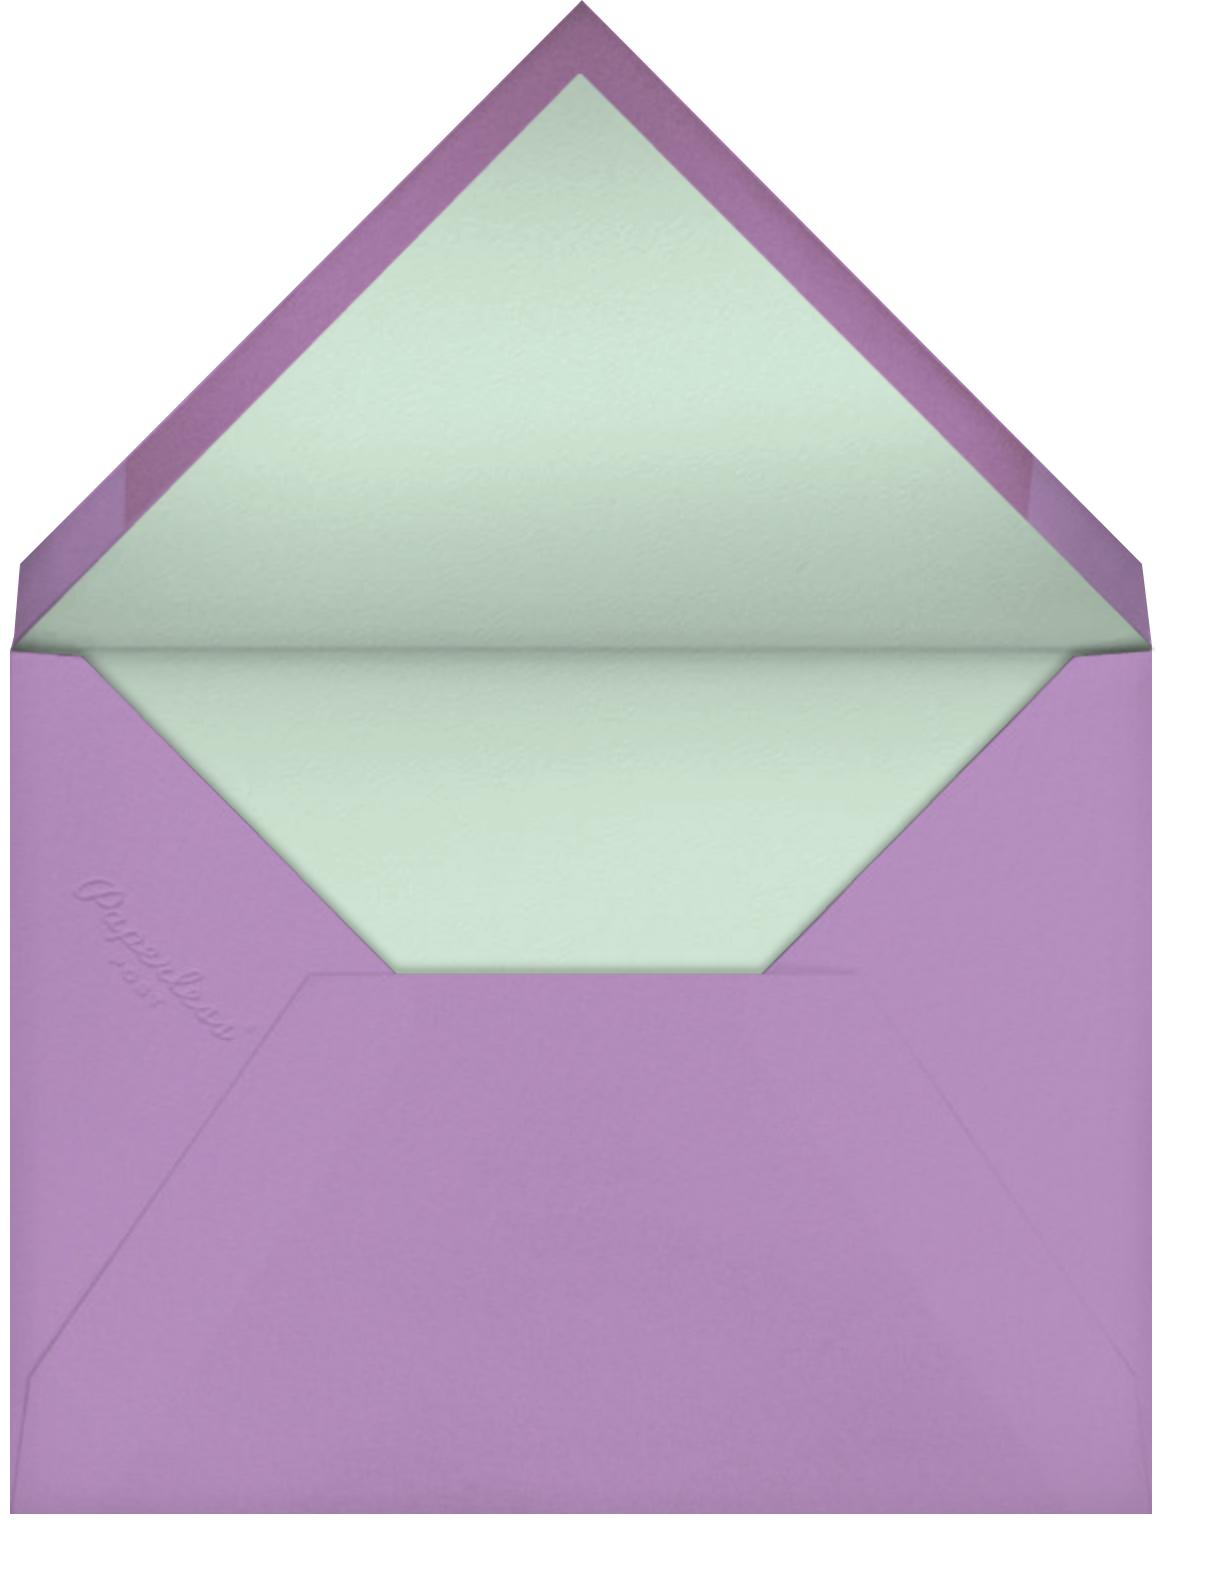 Painted Posies - Wisteria - kate spade new york - Easter - envelope back